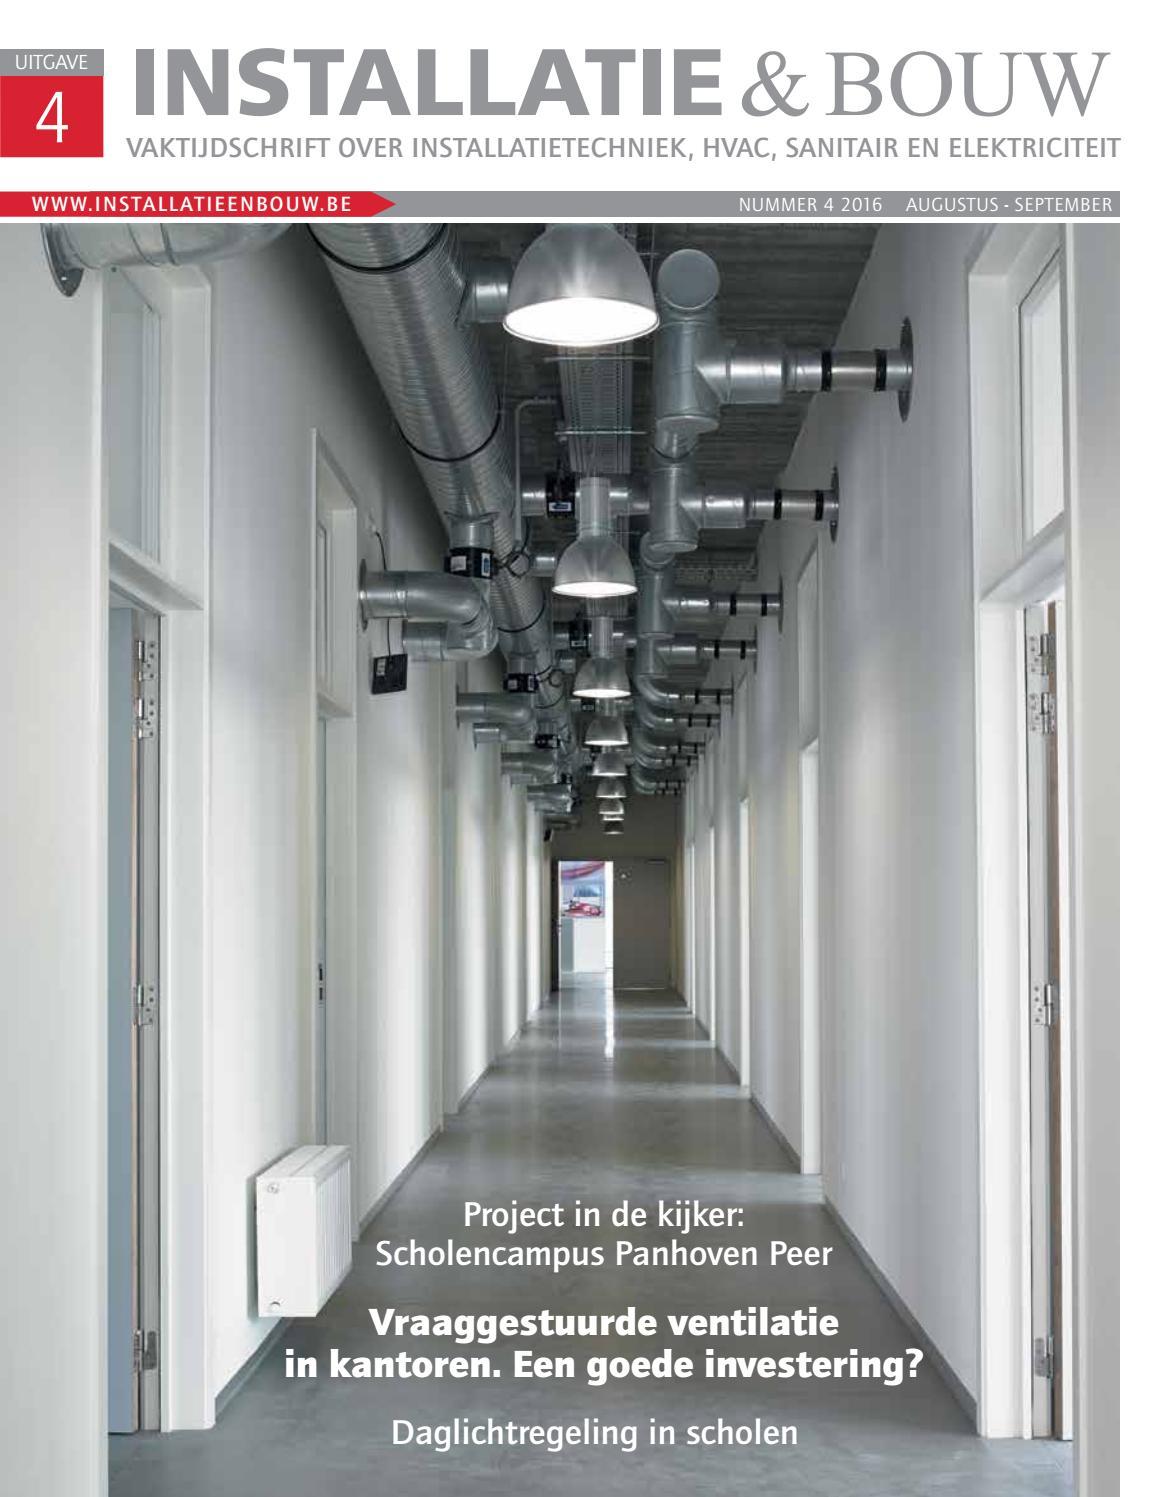 Installatie & bouw 04 2016 by louwers uitgeversorganisatie bv   issuu